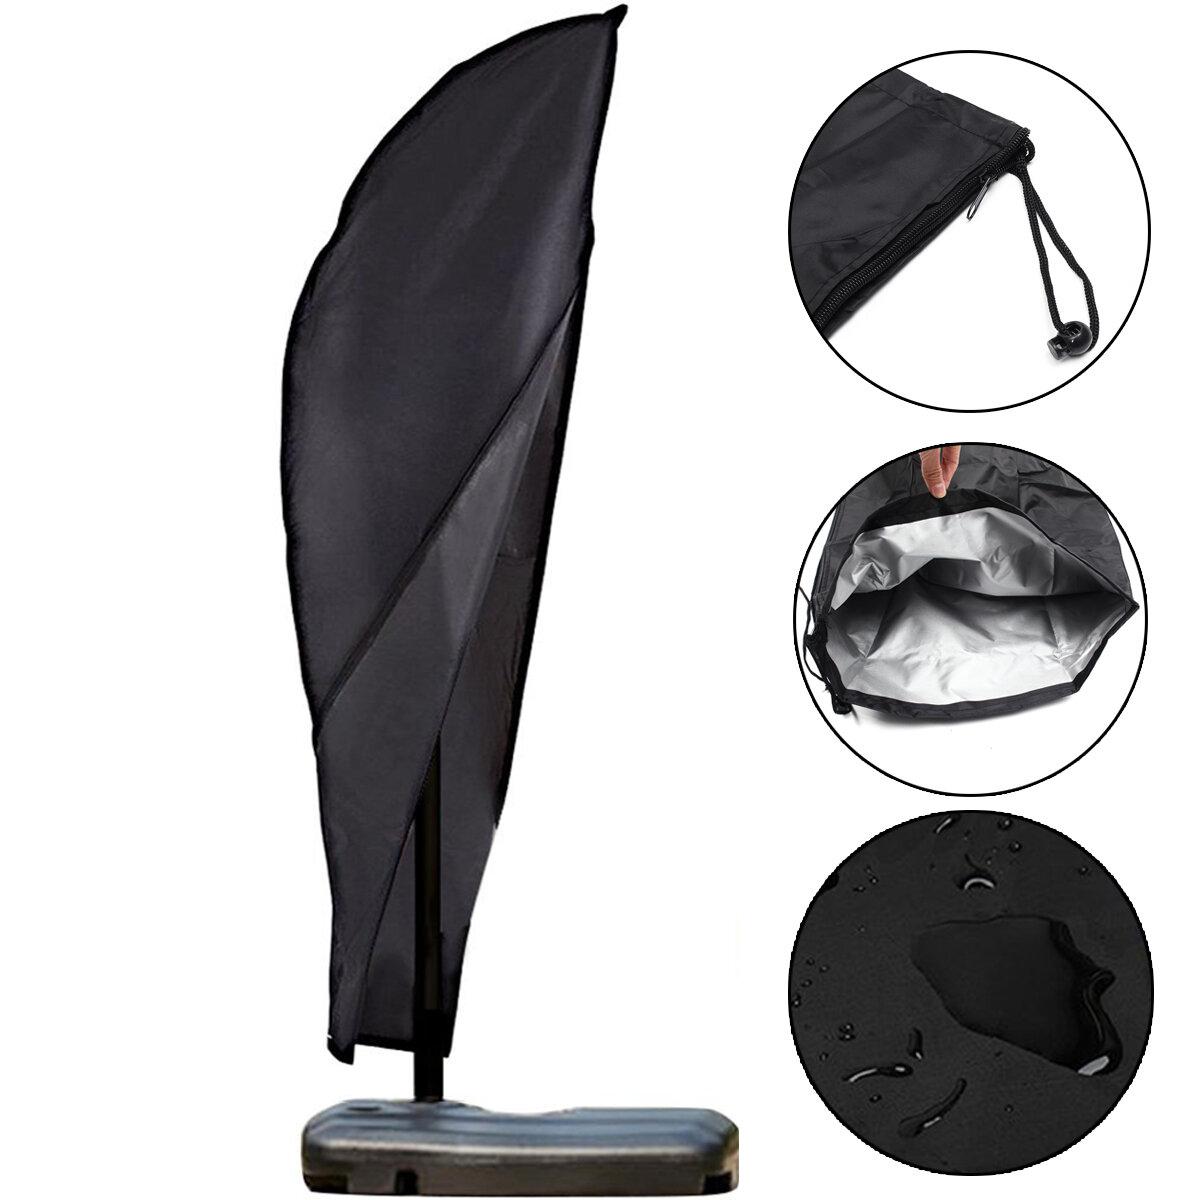 Garden Outdoor 9 11ft Offset Umbrella Frame Cover Waterproof Cantilever Umbrellas Parasol With Zipper Oxford Fabric Cod